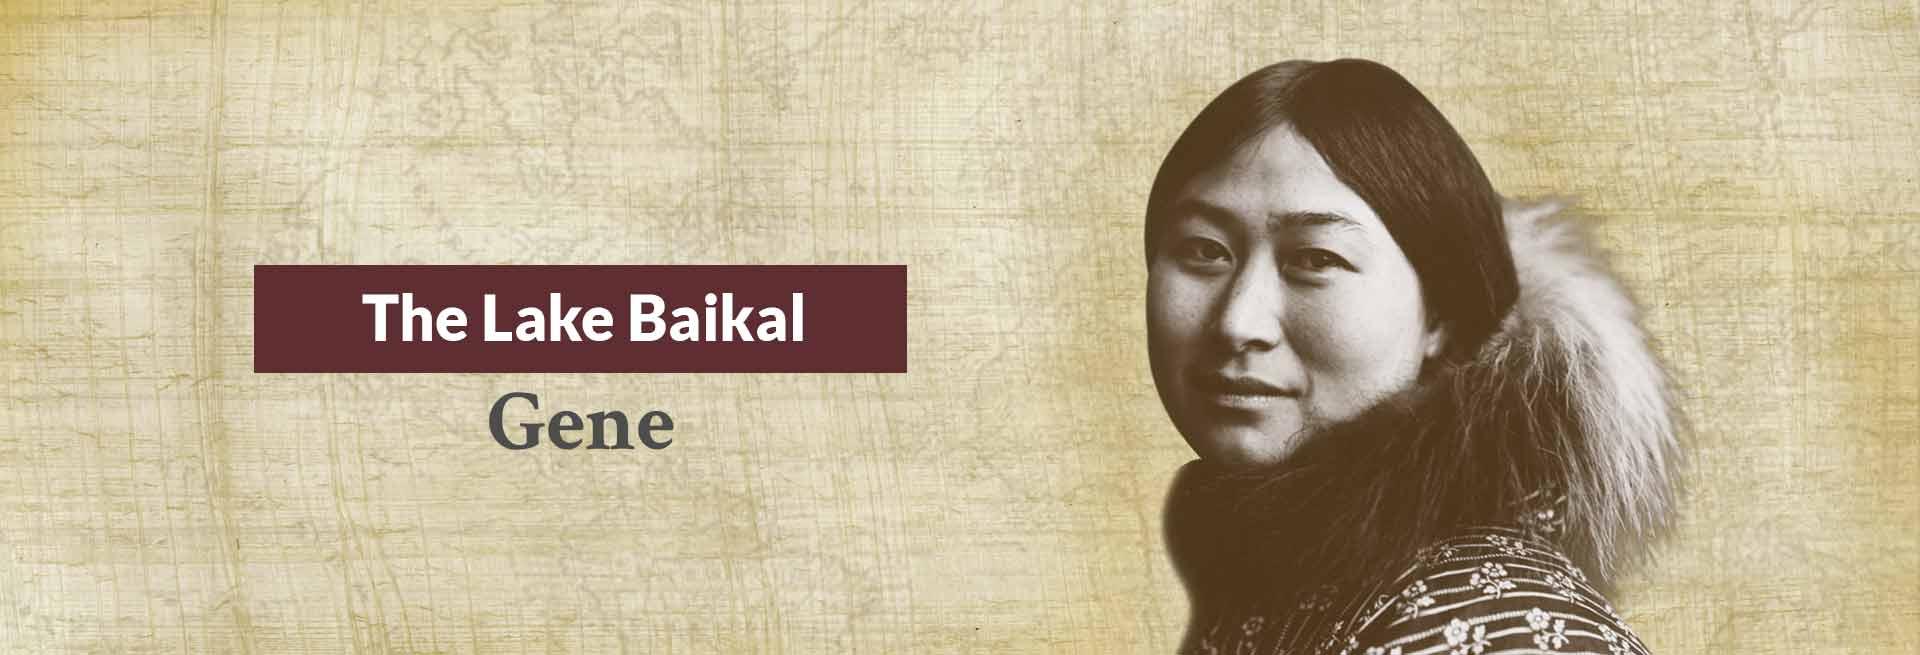 The Lake Baikal Gene Banner